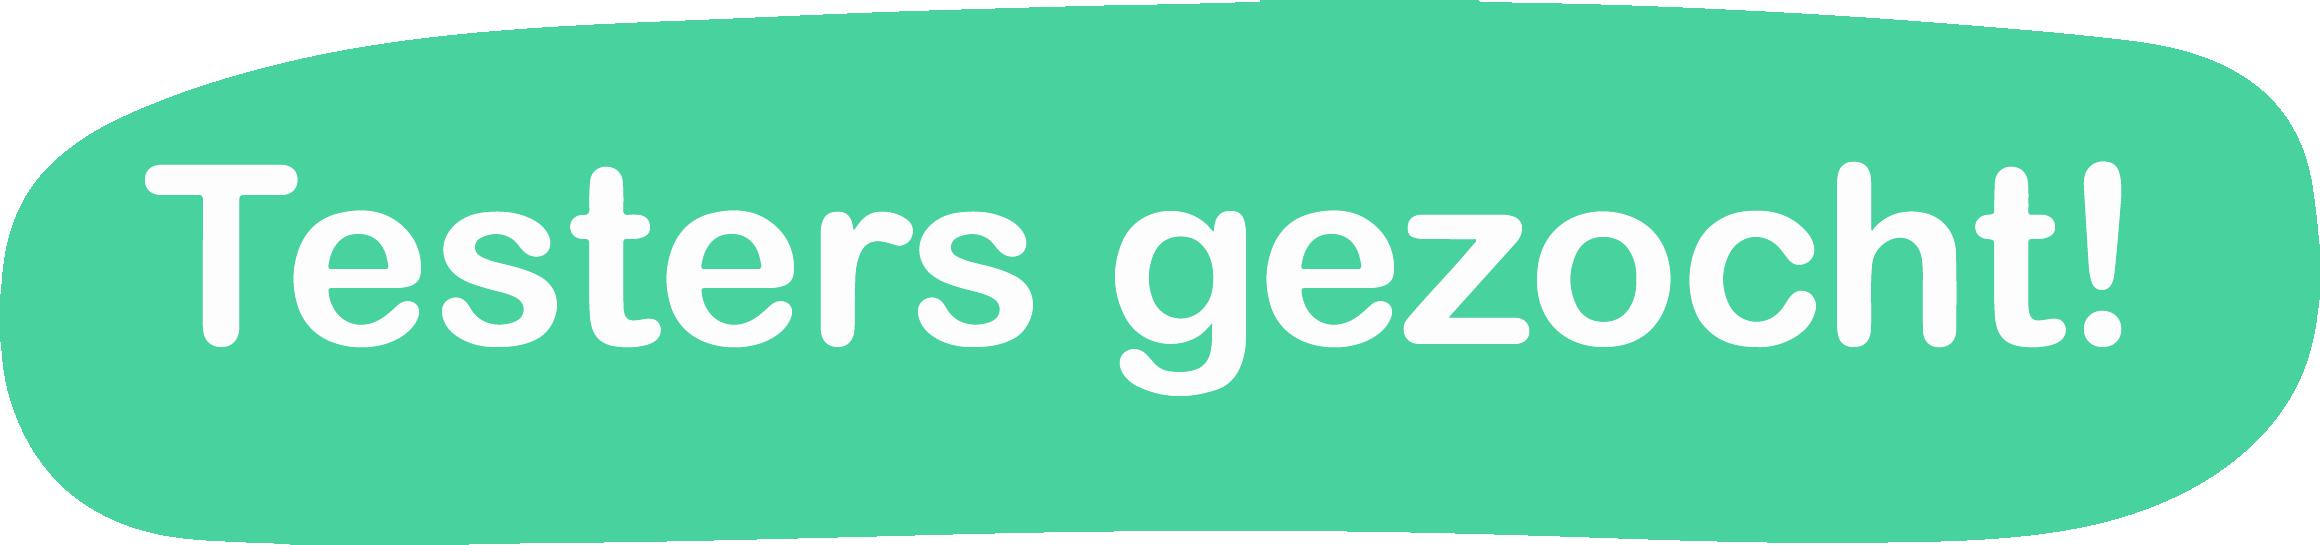 testers_gezocht_new